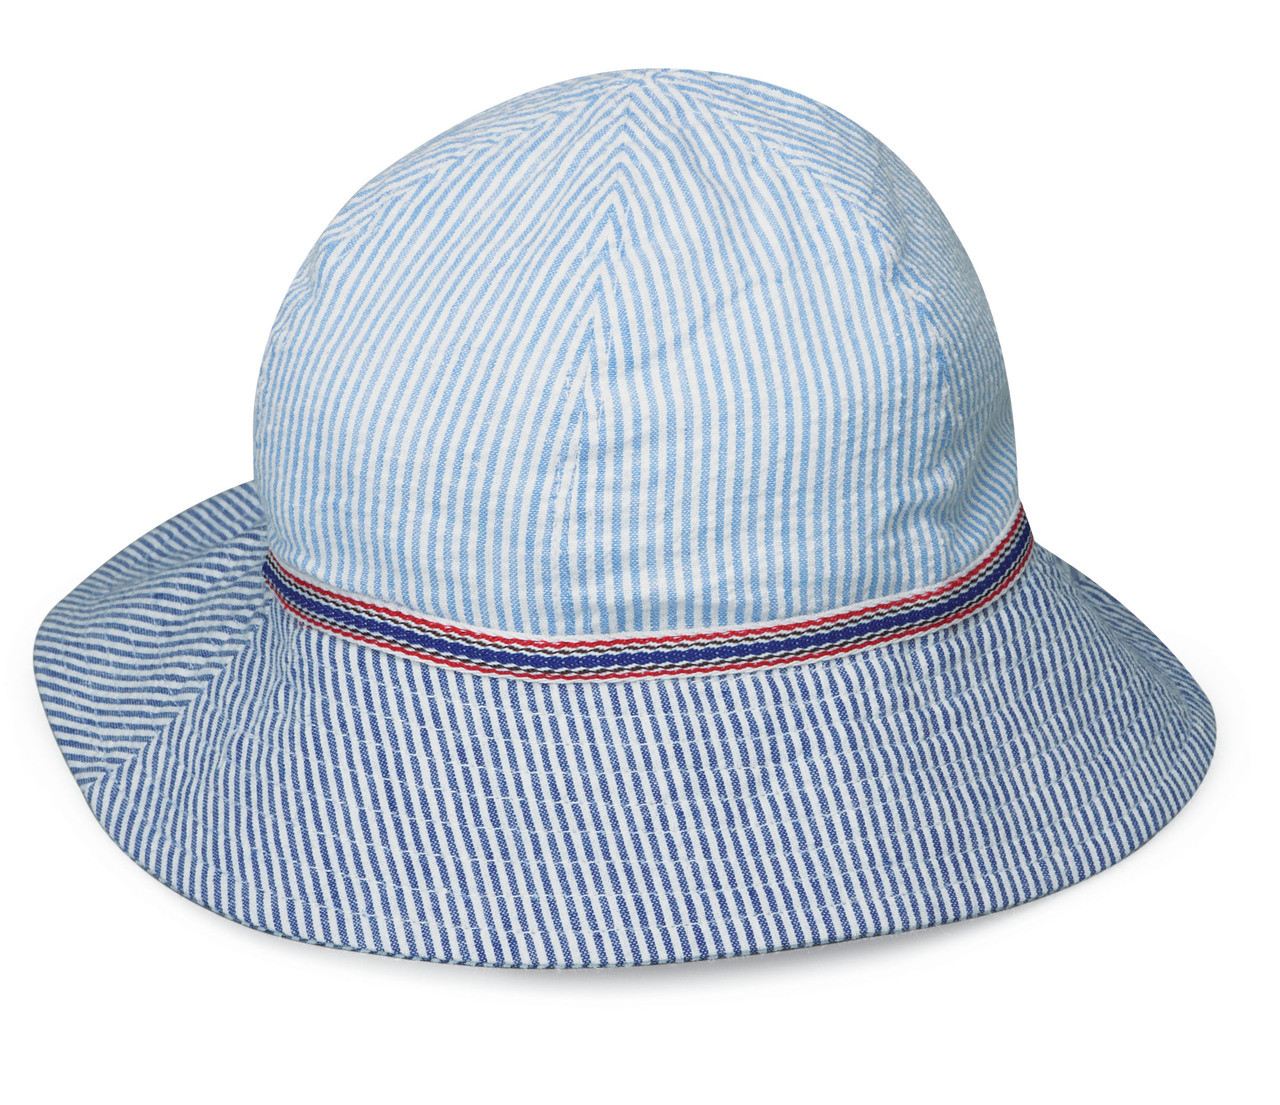 51e8847b213 Wallaroo Baby UV UPF50 platypus sun hat seersucker